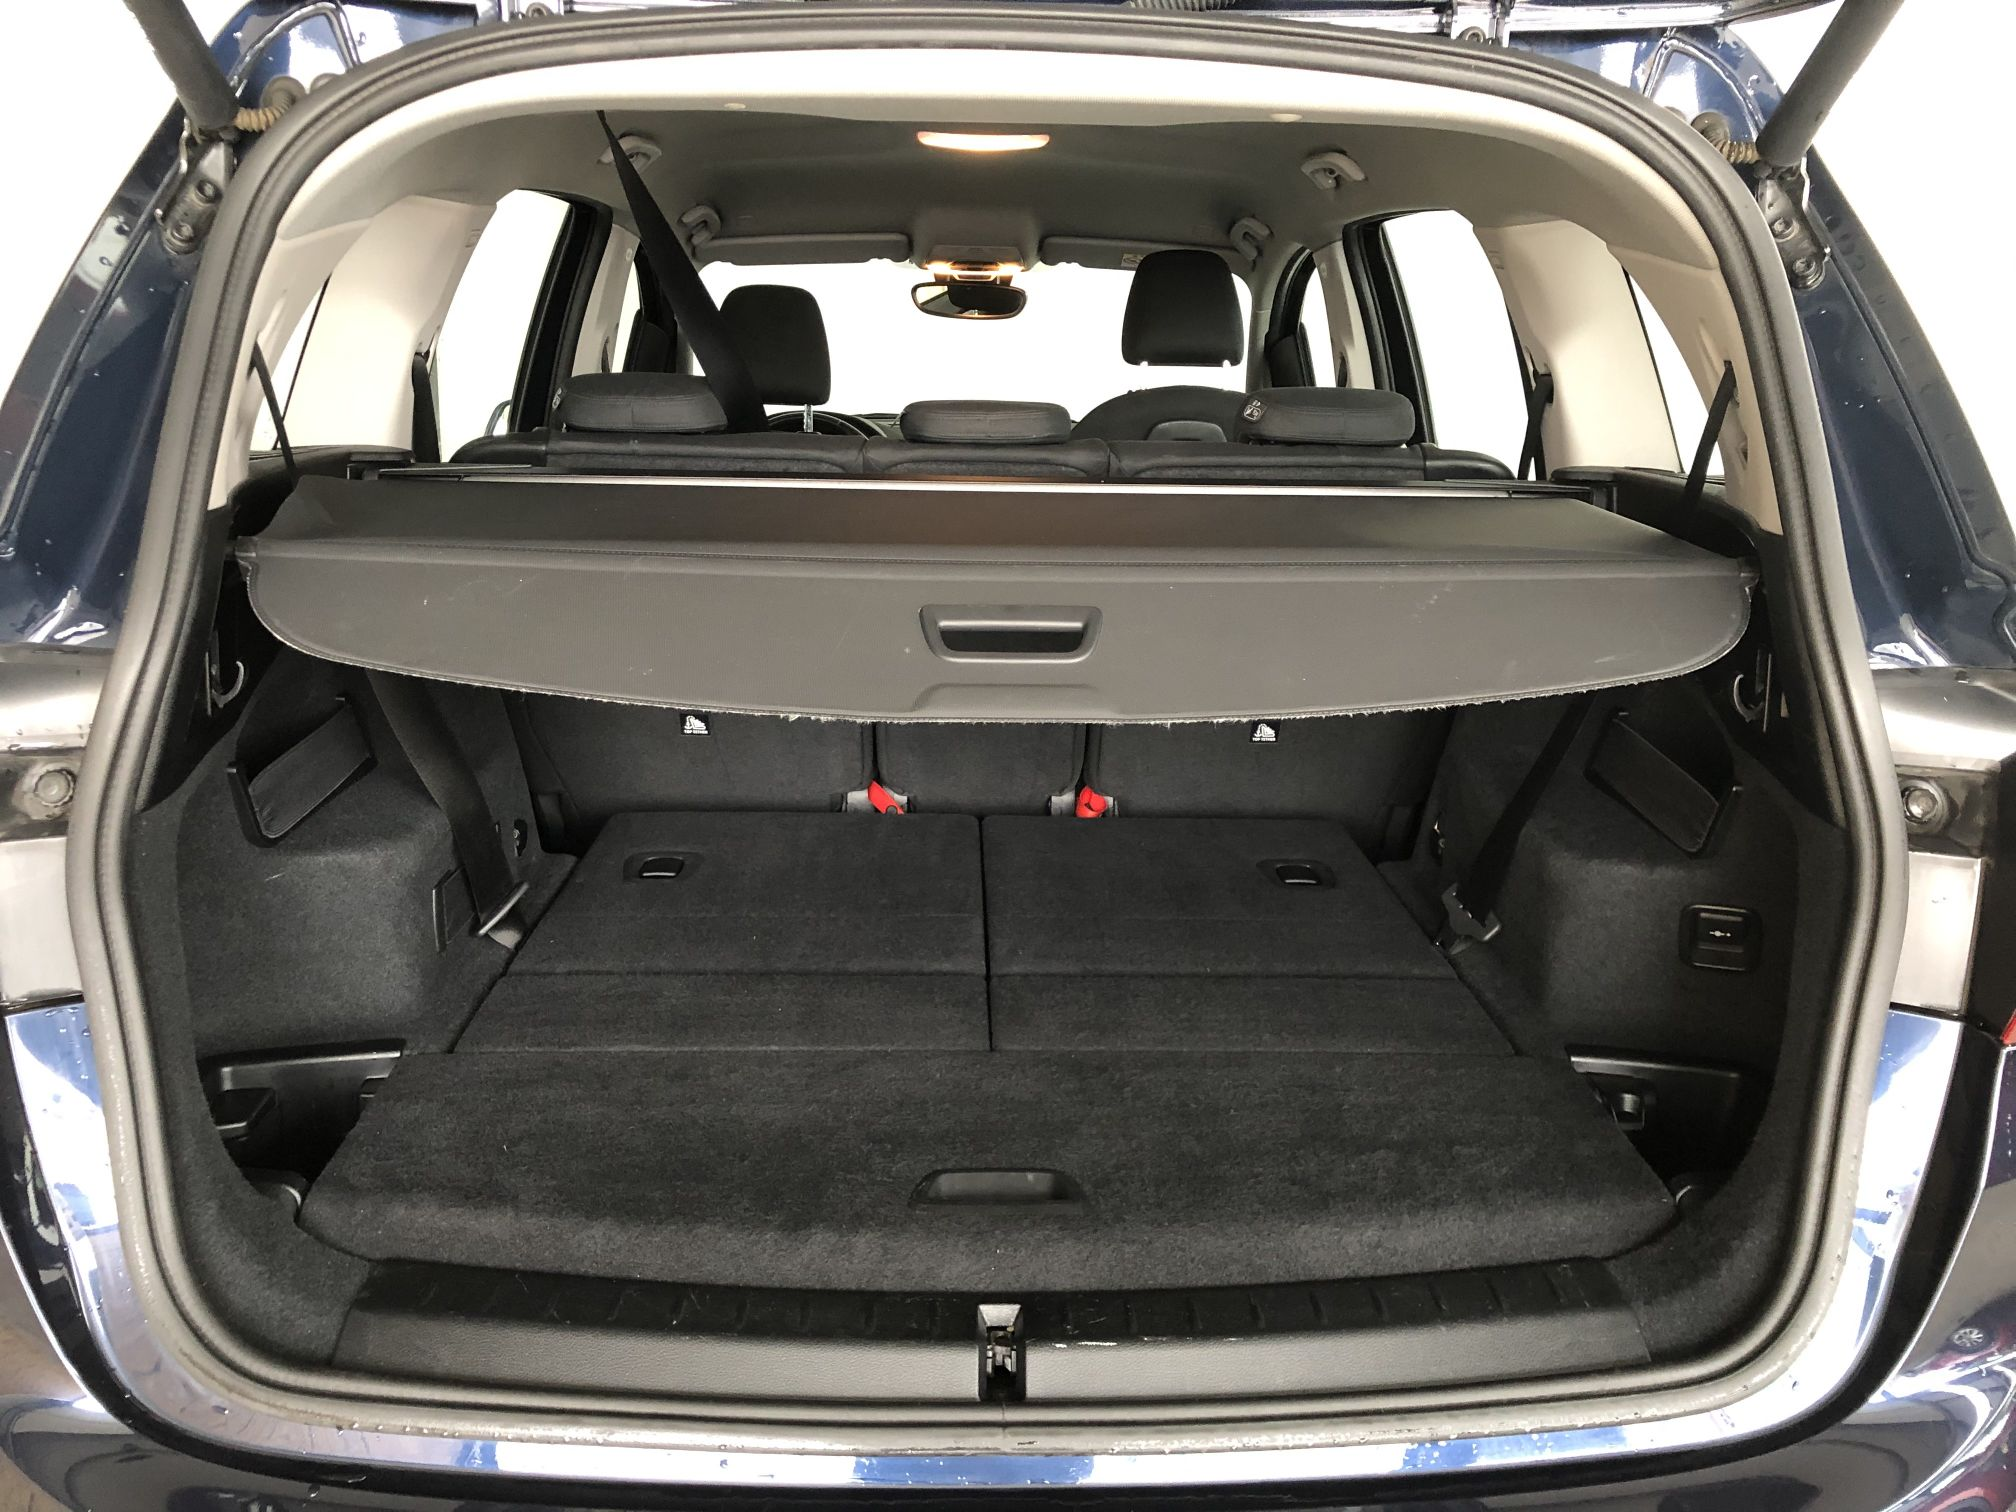 BMW automatico 7plazas diesel